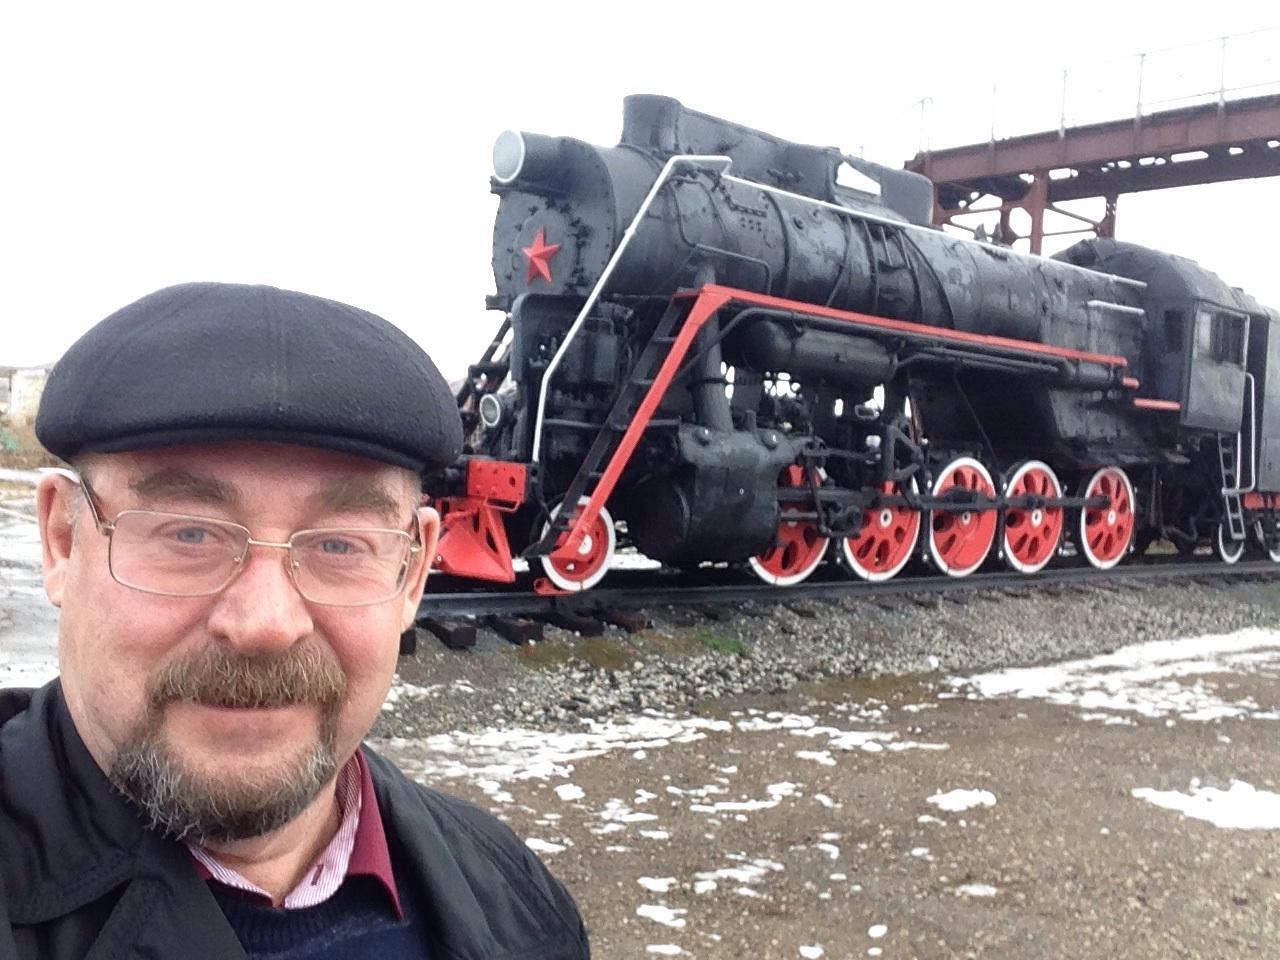 Железнодорожники Якутии  поздравляют с 70-летним юбилеем Владимира Членова